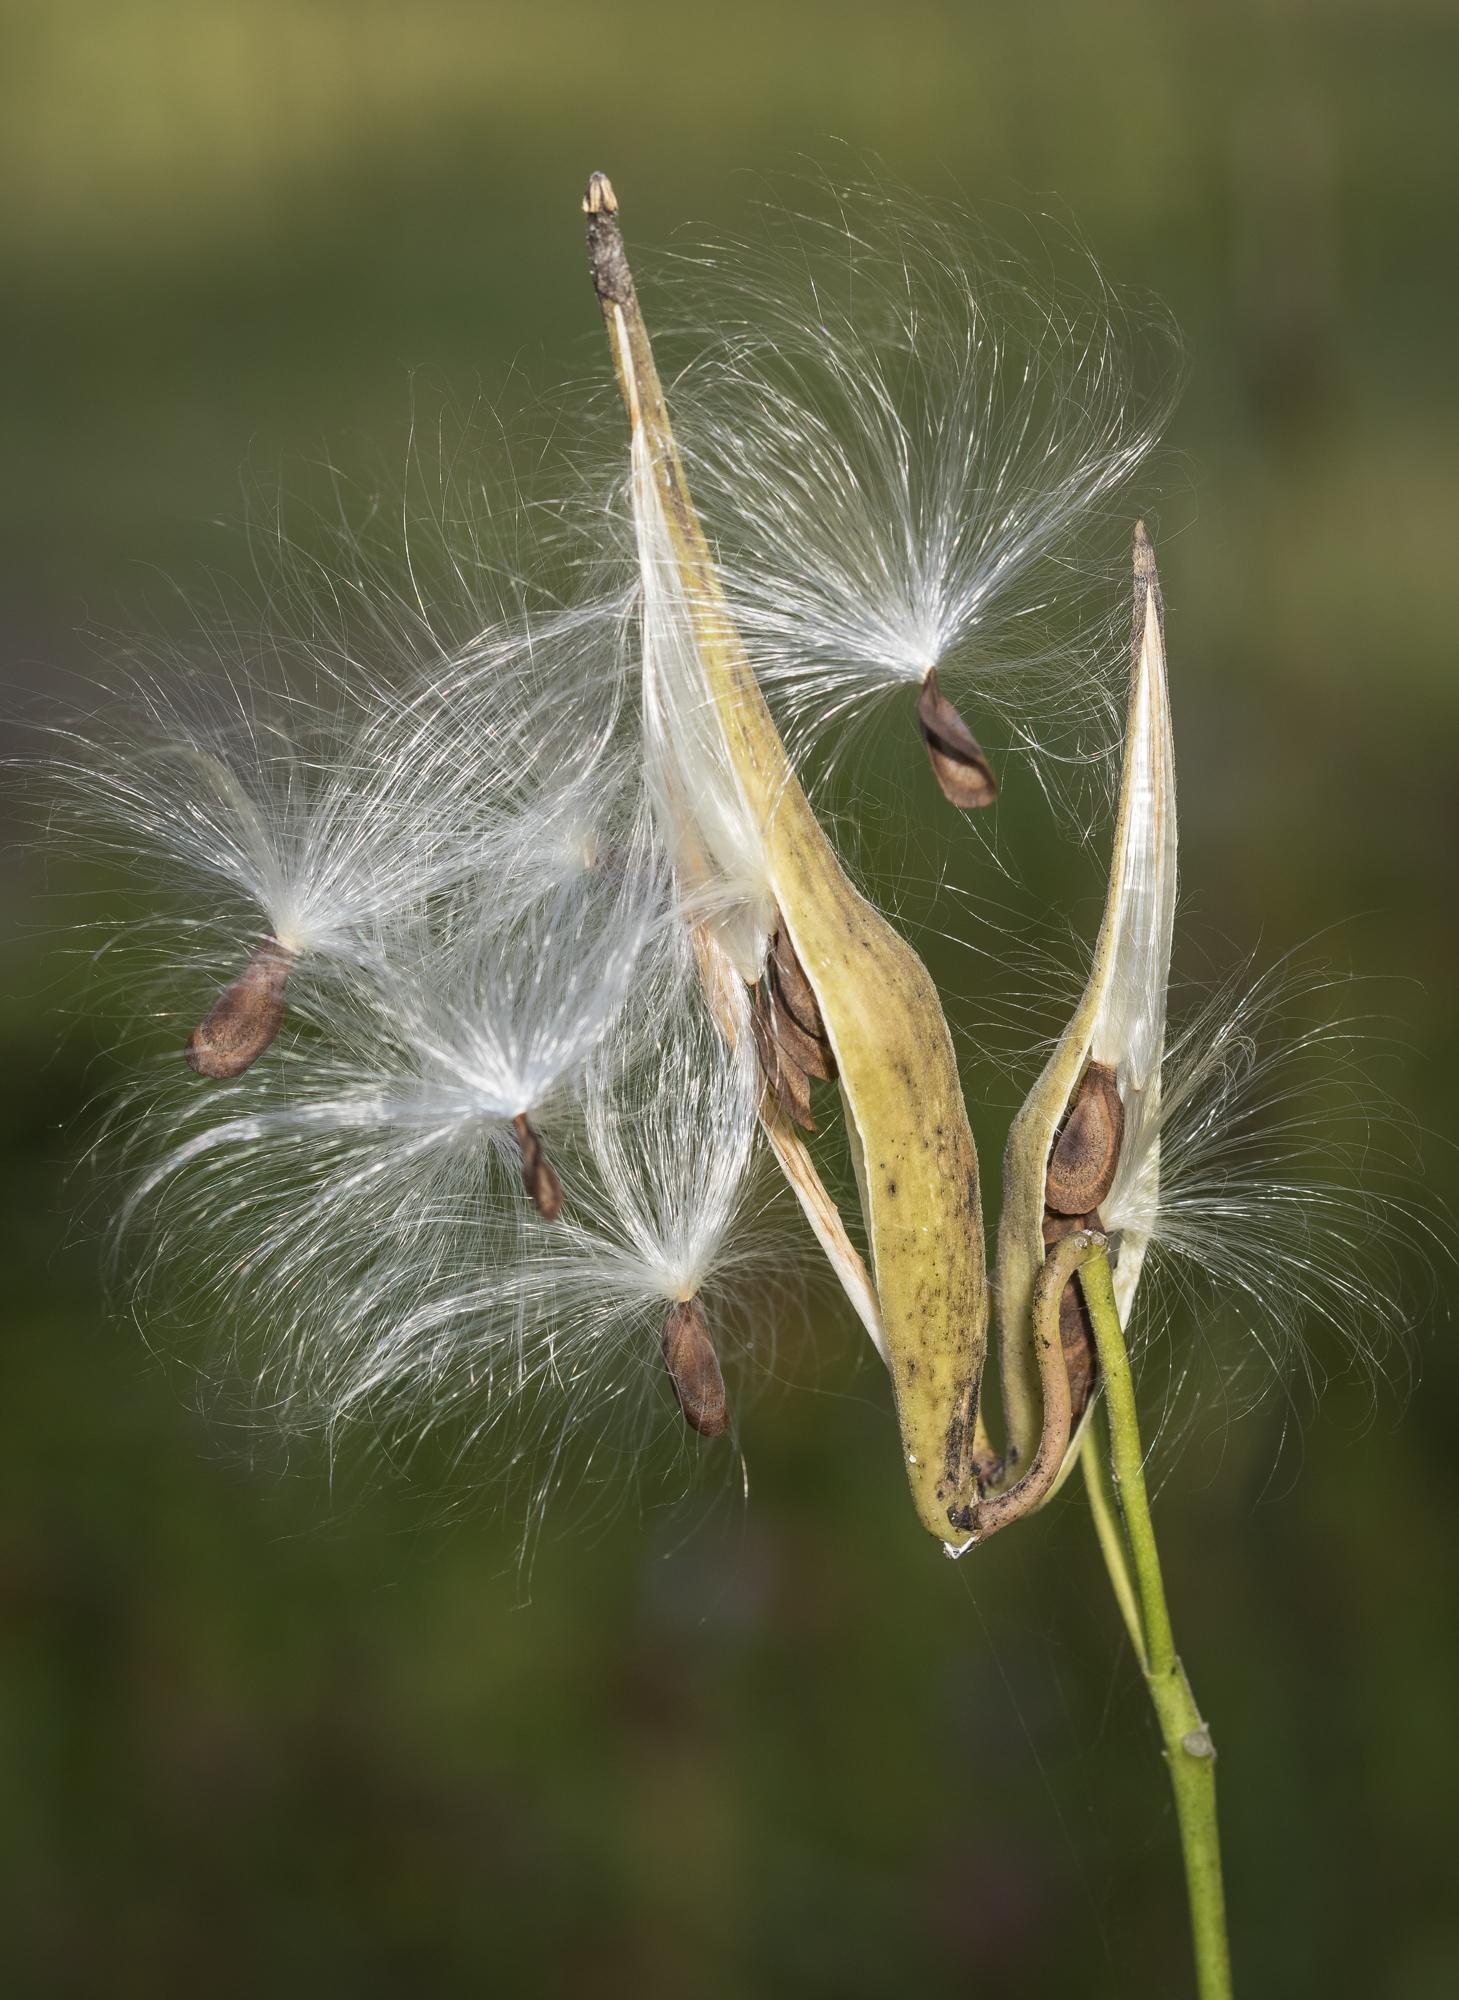 Few-flowered milkweed seed pod